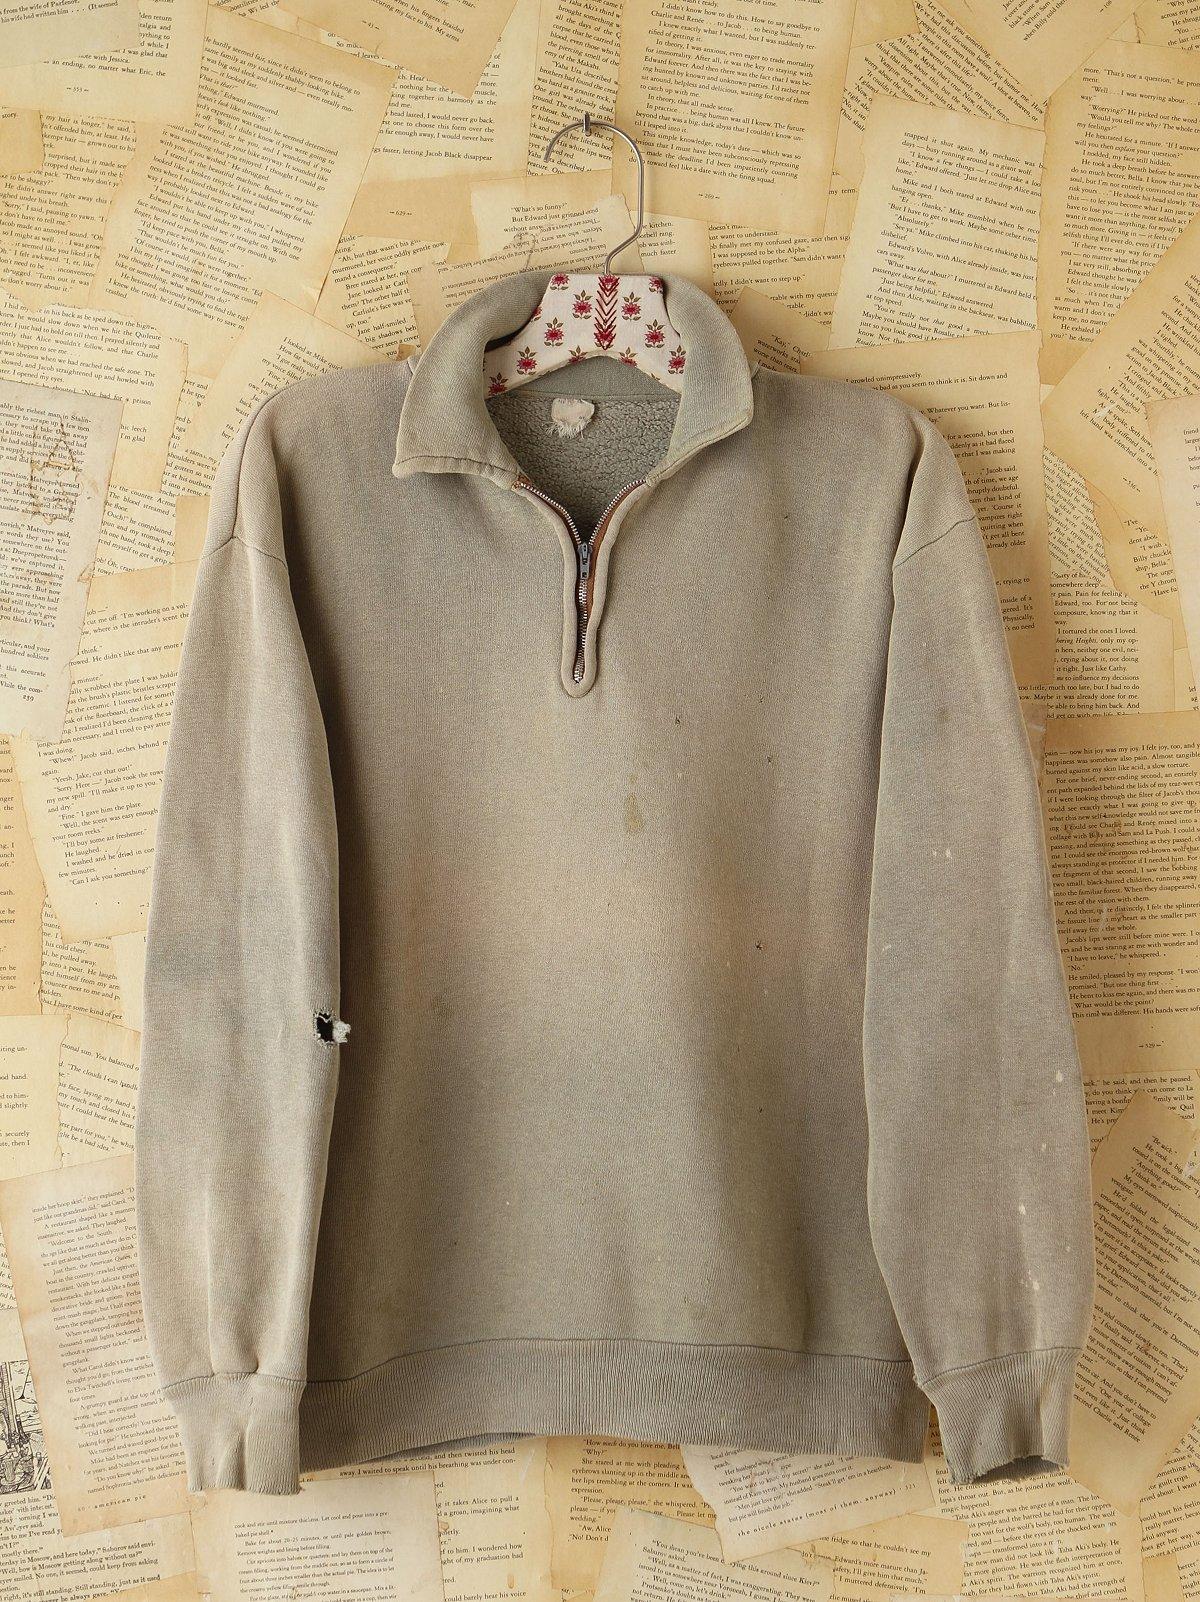 Vintage Faded Green 1950s Sweatshirt